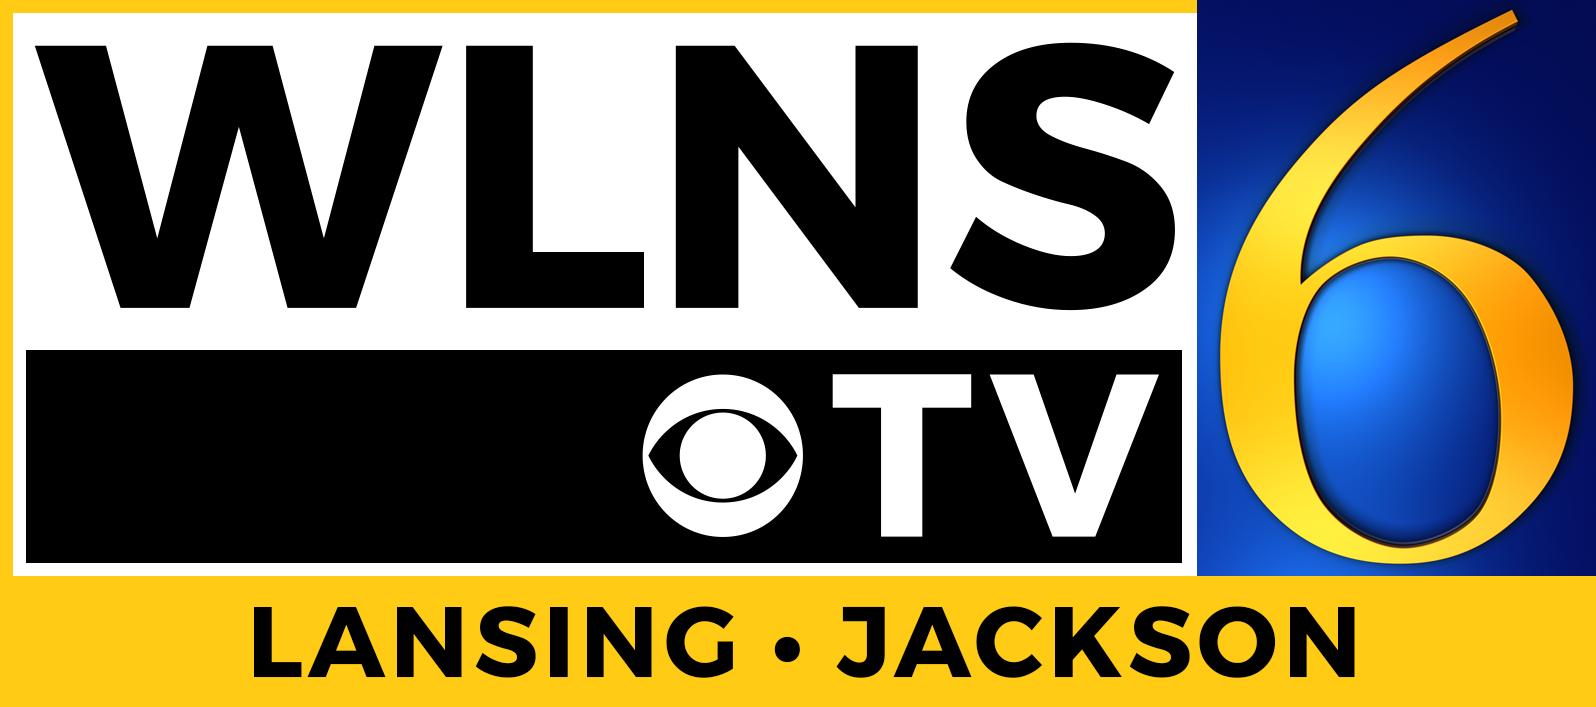 WLNS CBS TV Lansing Jackson